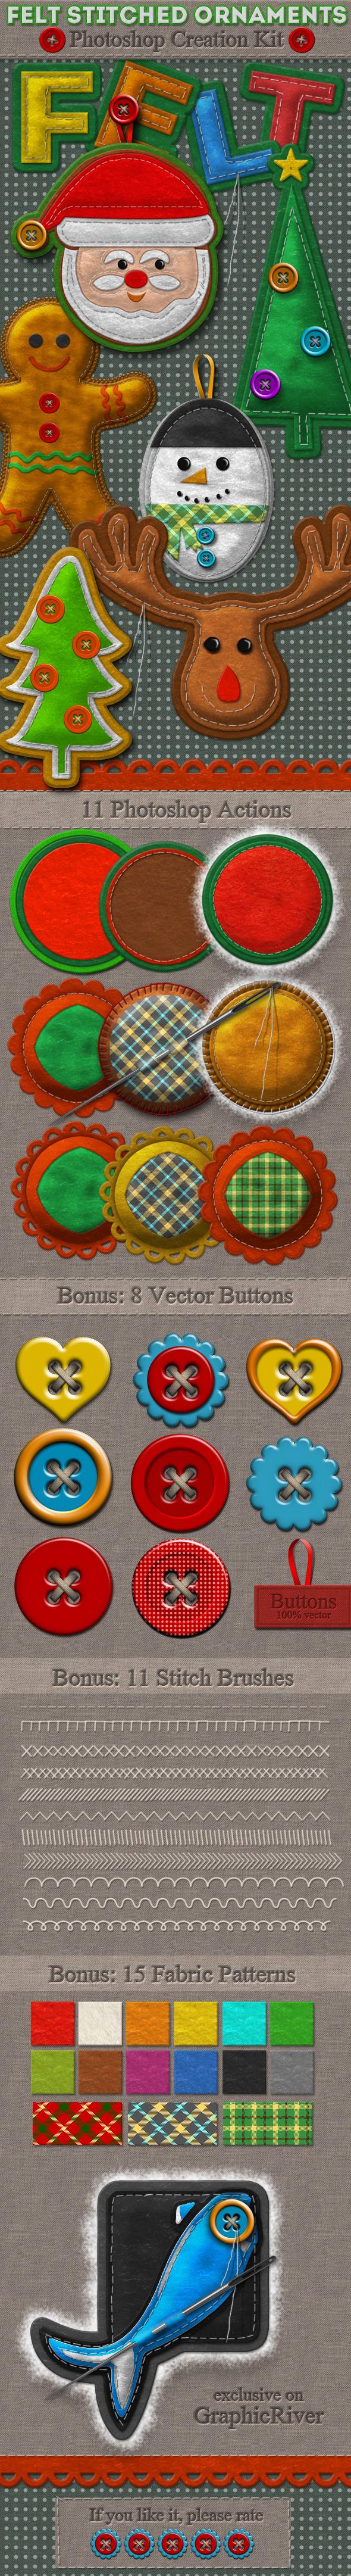 Felt Stitched Ornaments Photoshop Creation Kit - Utilities Actions